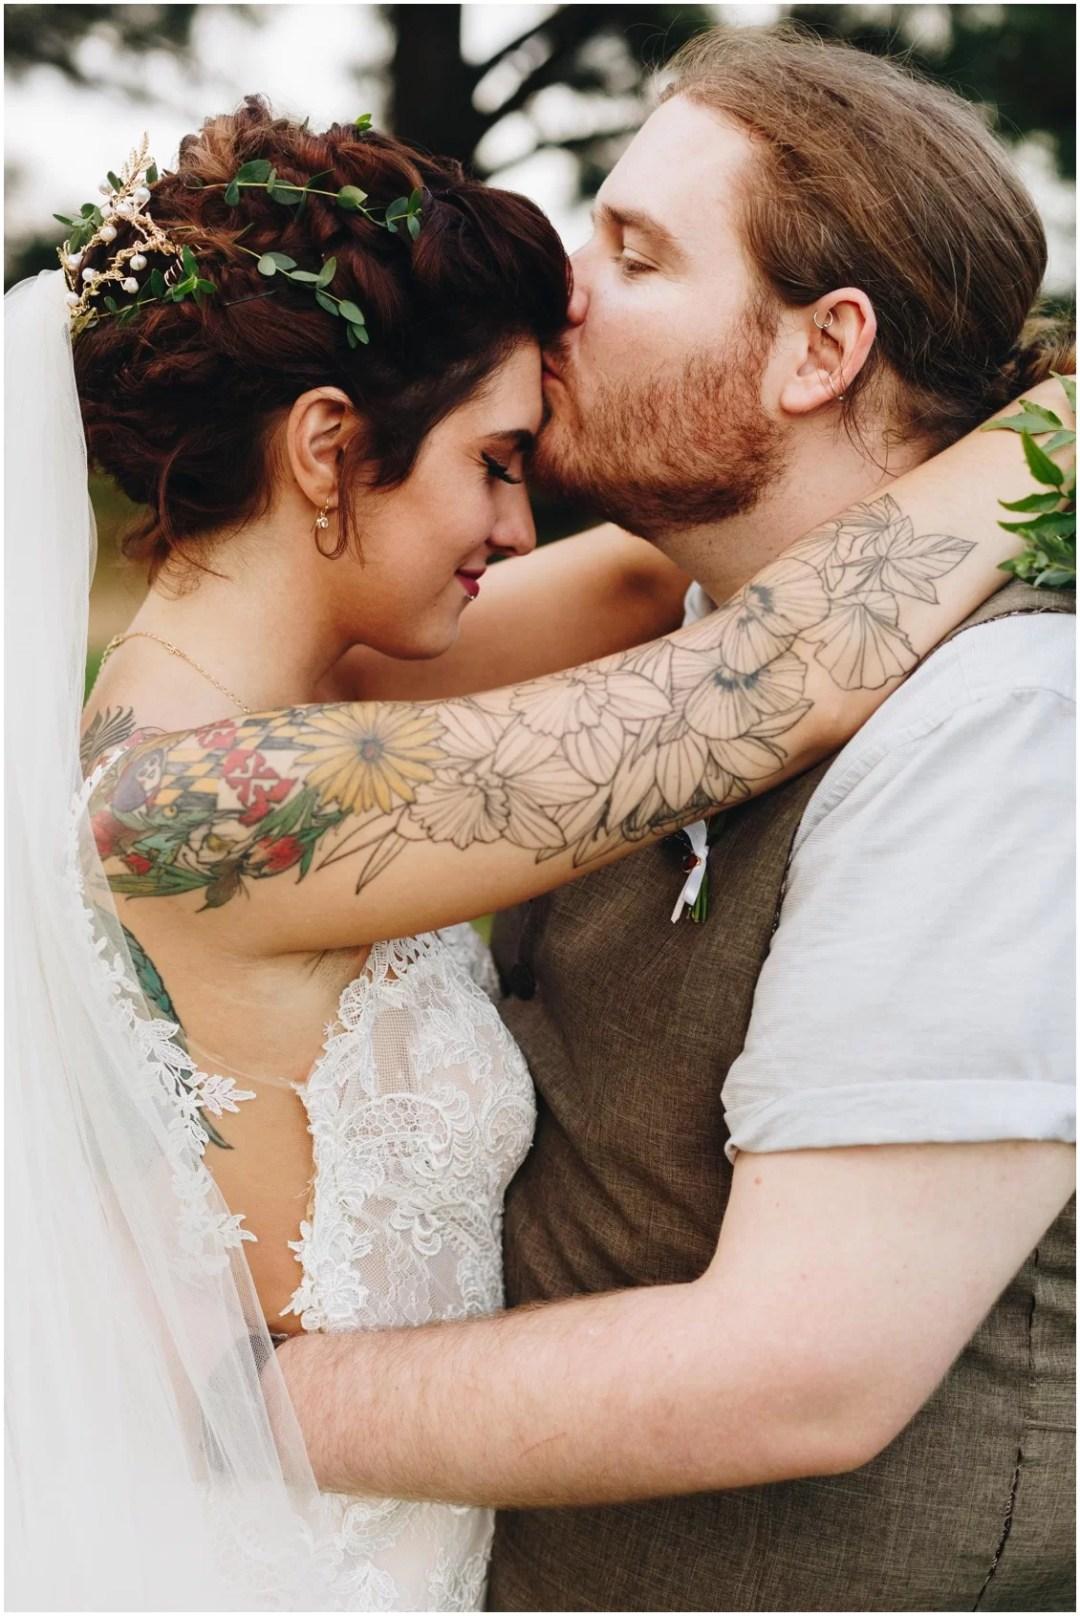 Tatted bride, bearded groom, and bride's hair by Hair Rehab. |Eastern Shore Wedding|